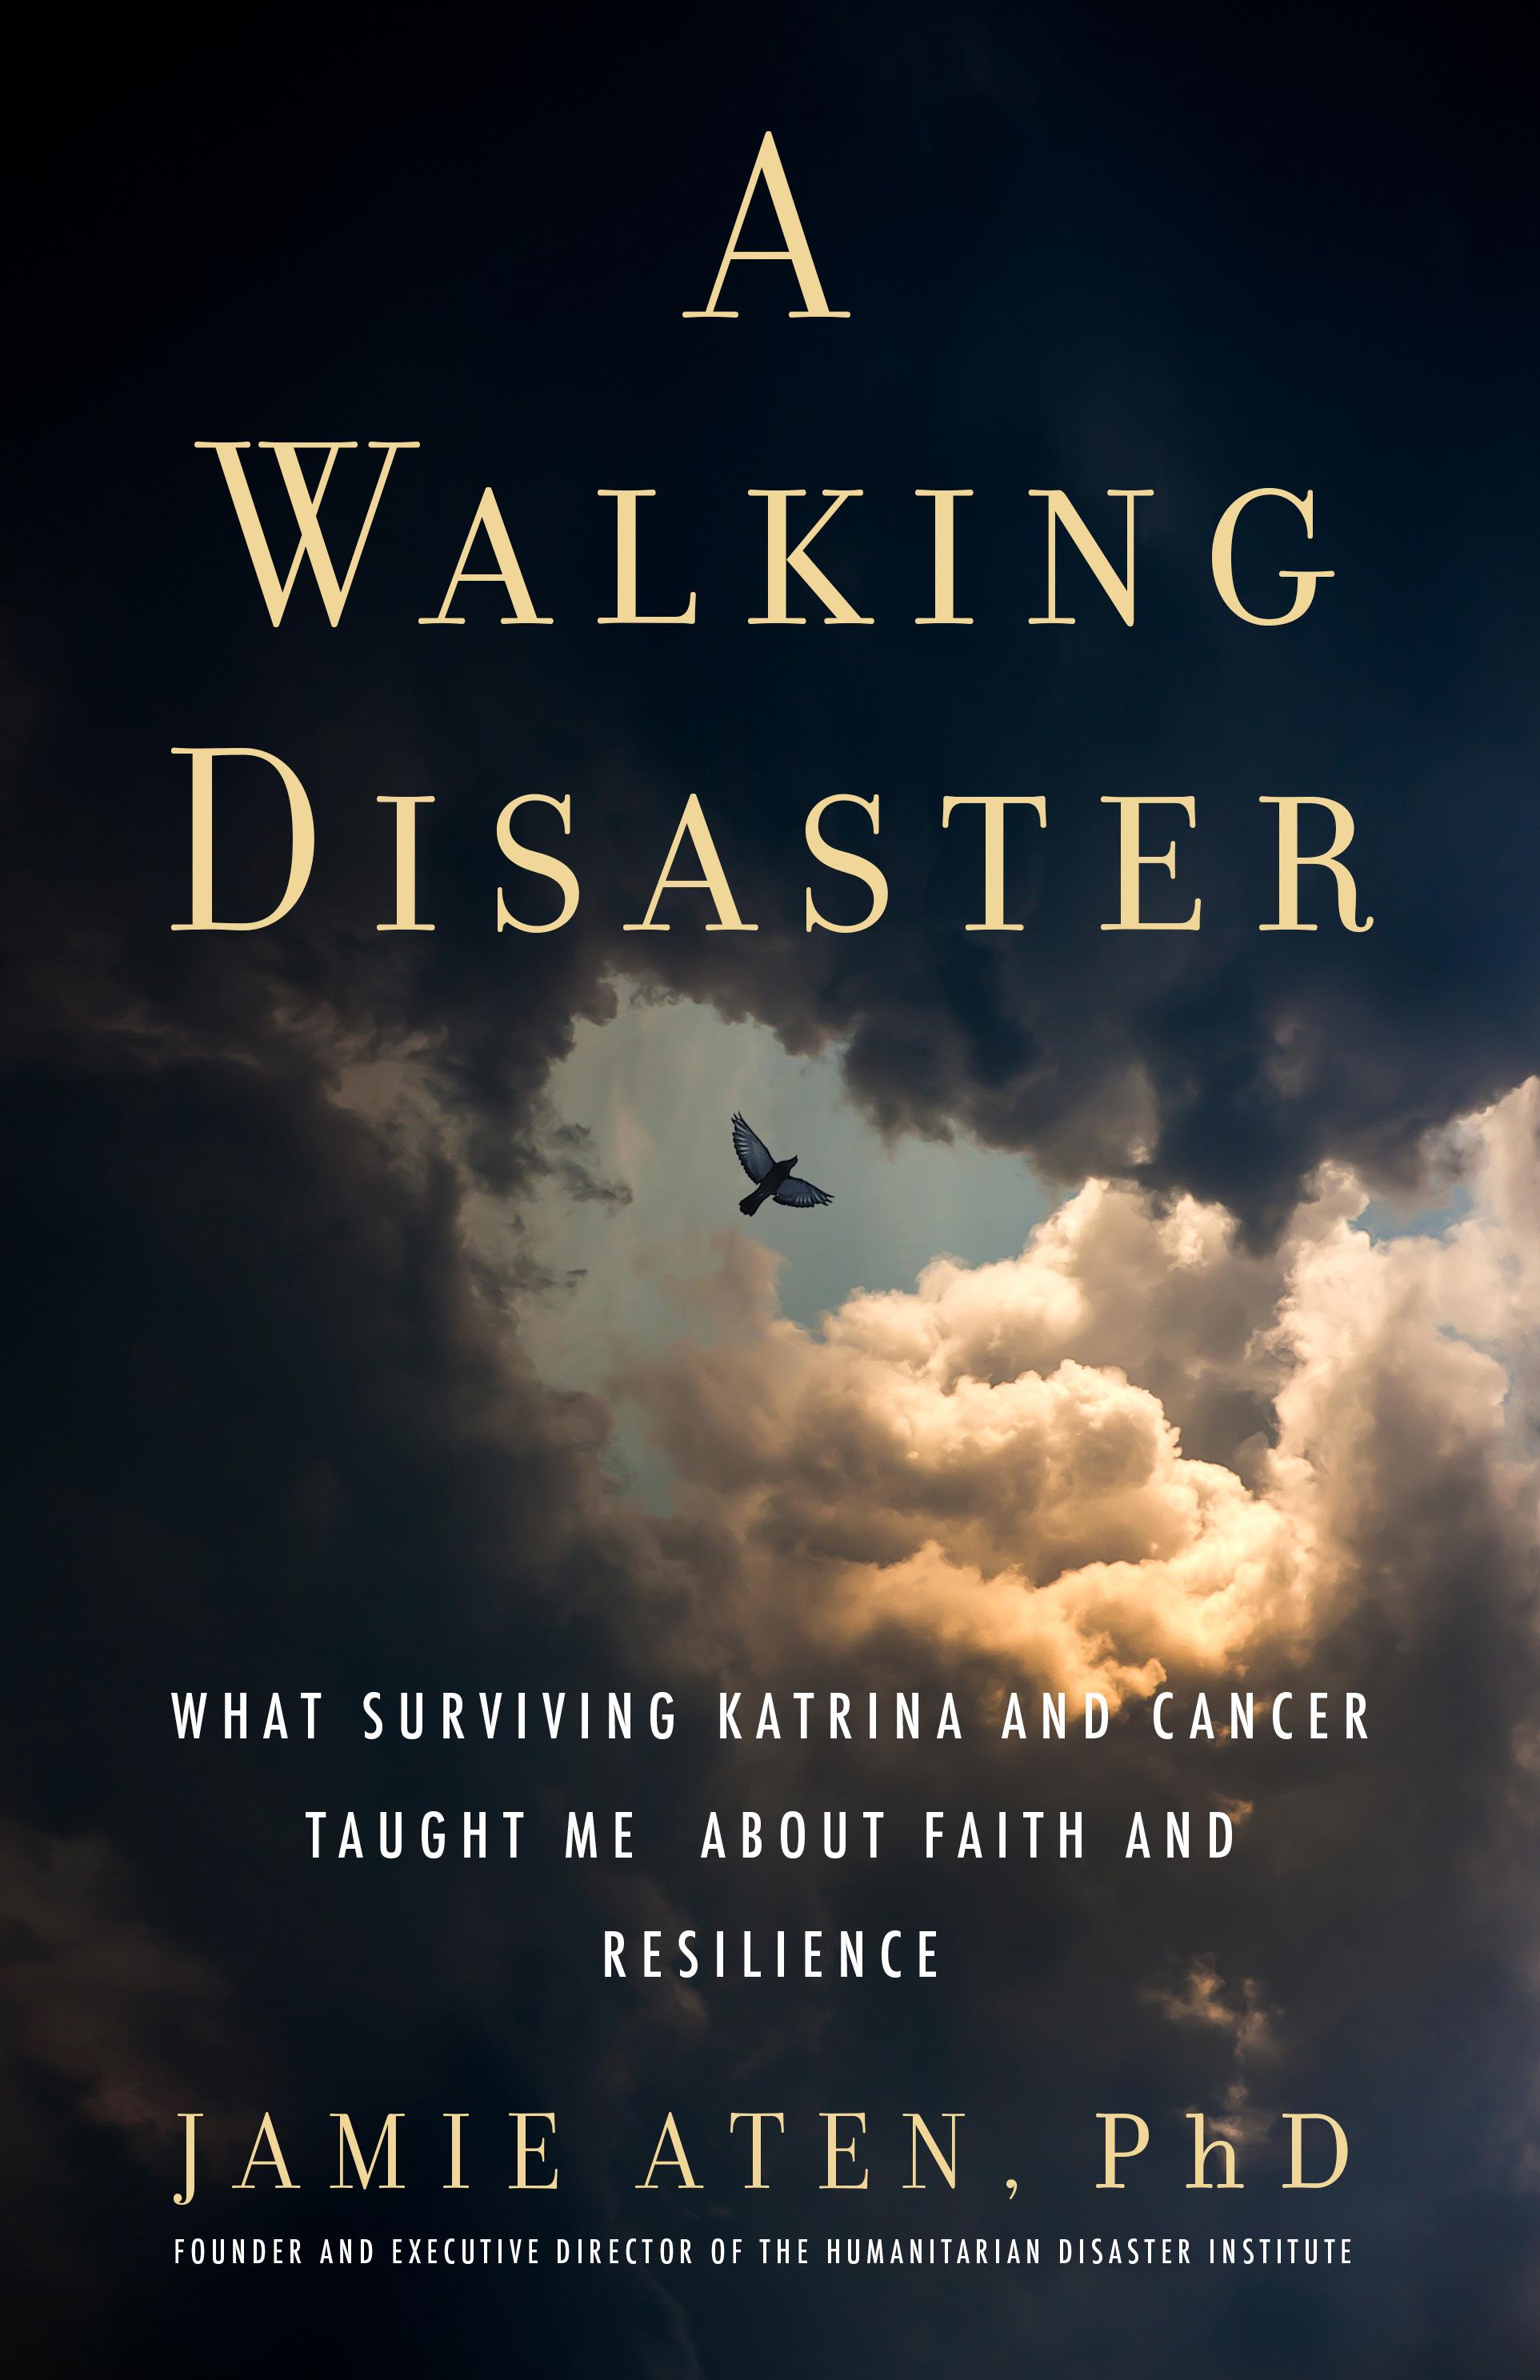 Walking Disaster-cover.jpg